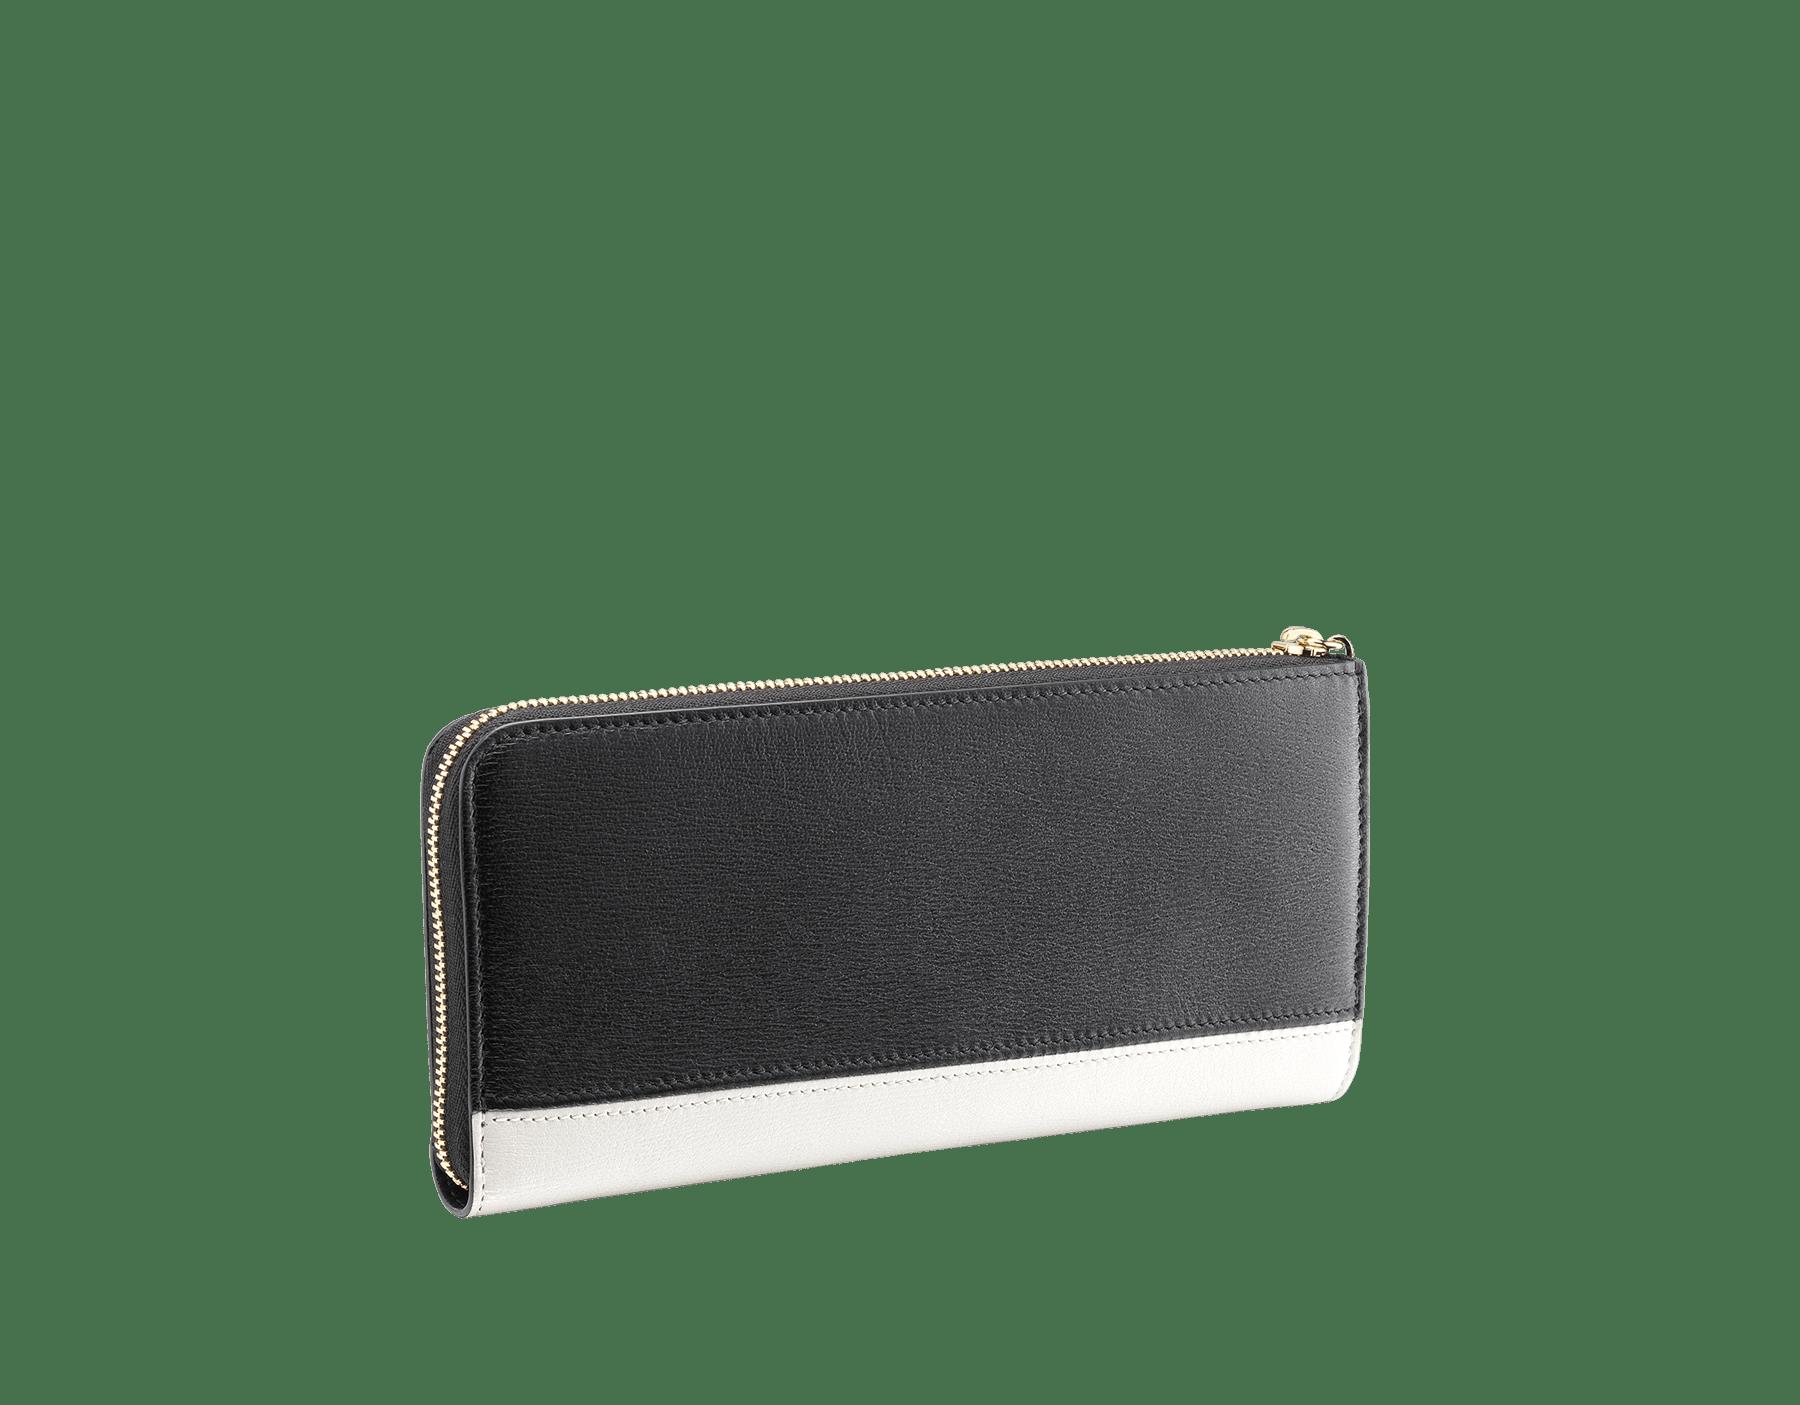 B.zero1 L-shaped zipped wallet in daisy topaz, taffy quartz goatskin and taffy quartz nappa. Iconic B.zero1 zip puller in light gold-plated brass. BZA-WLT-MZP-SLIM-L image 5